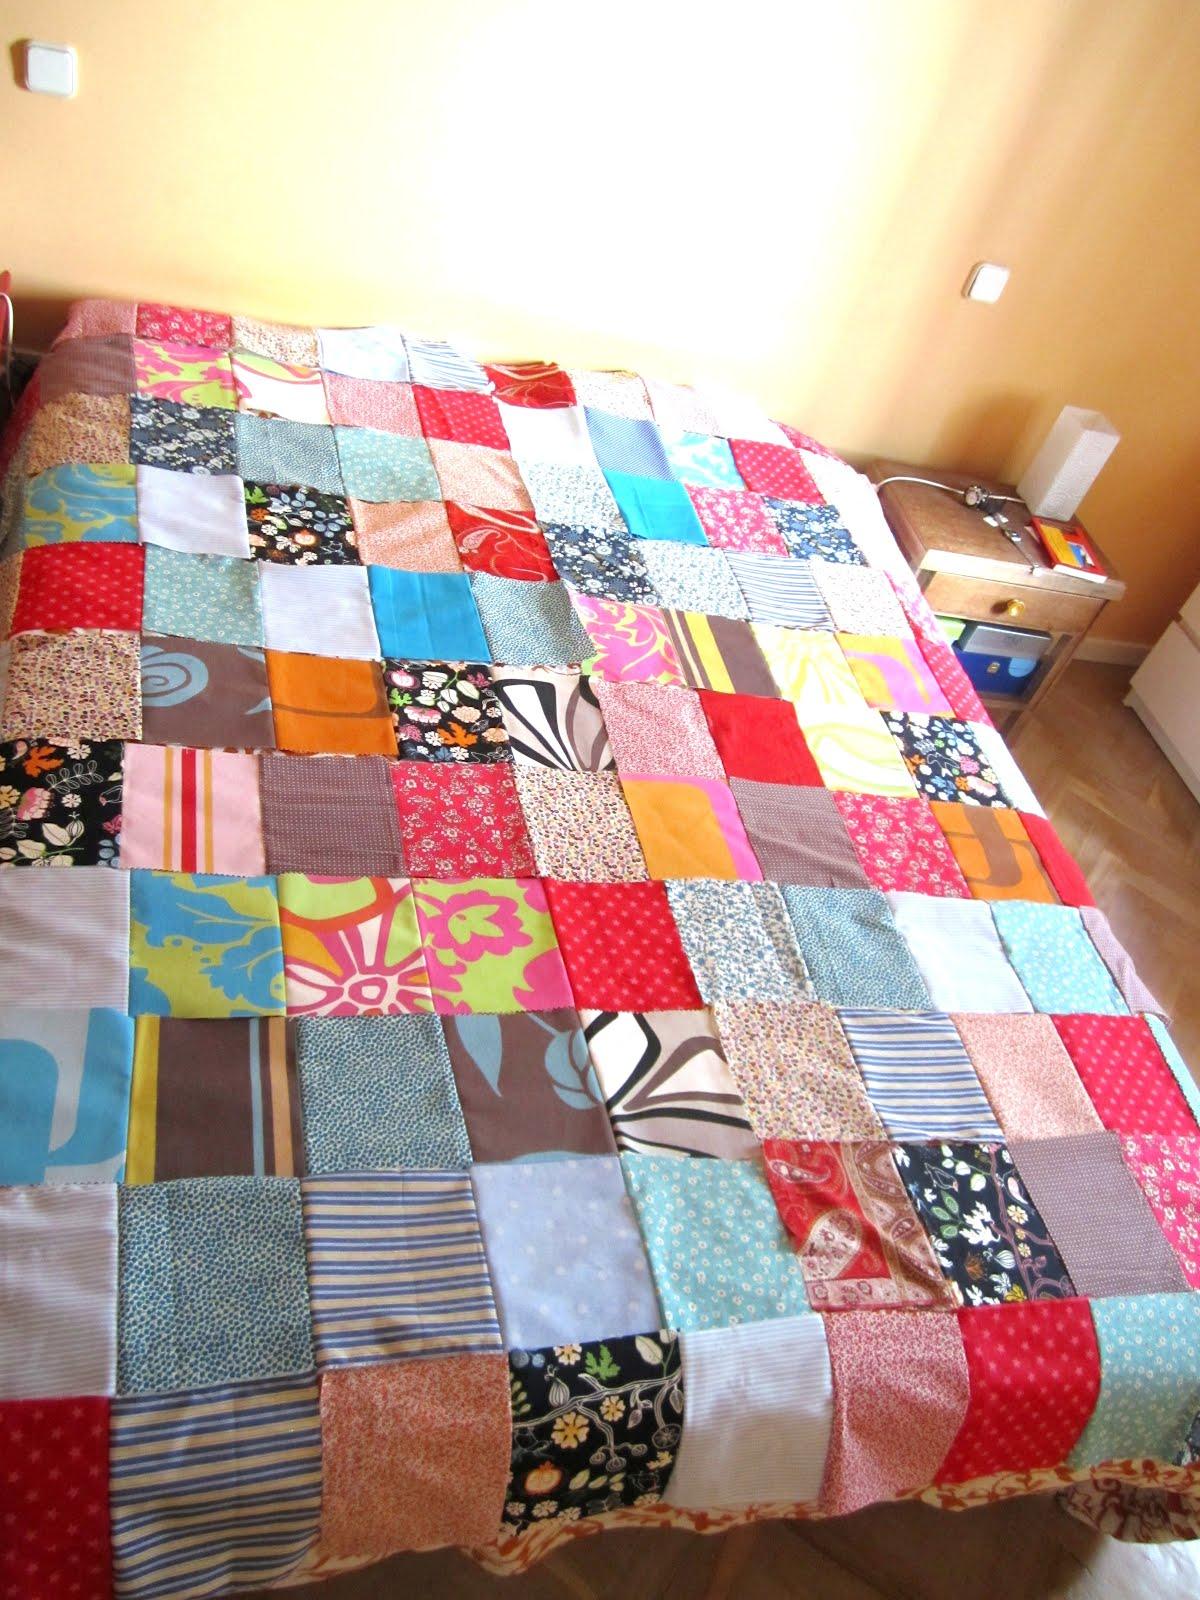 Como hacer una colcha patchwork imagui - Casas de patchwork ...